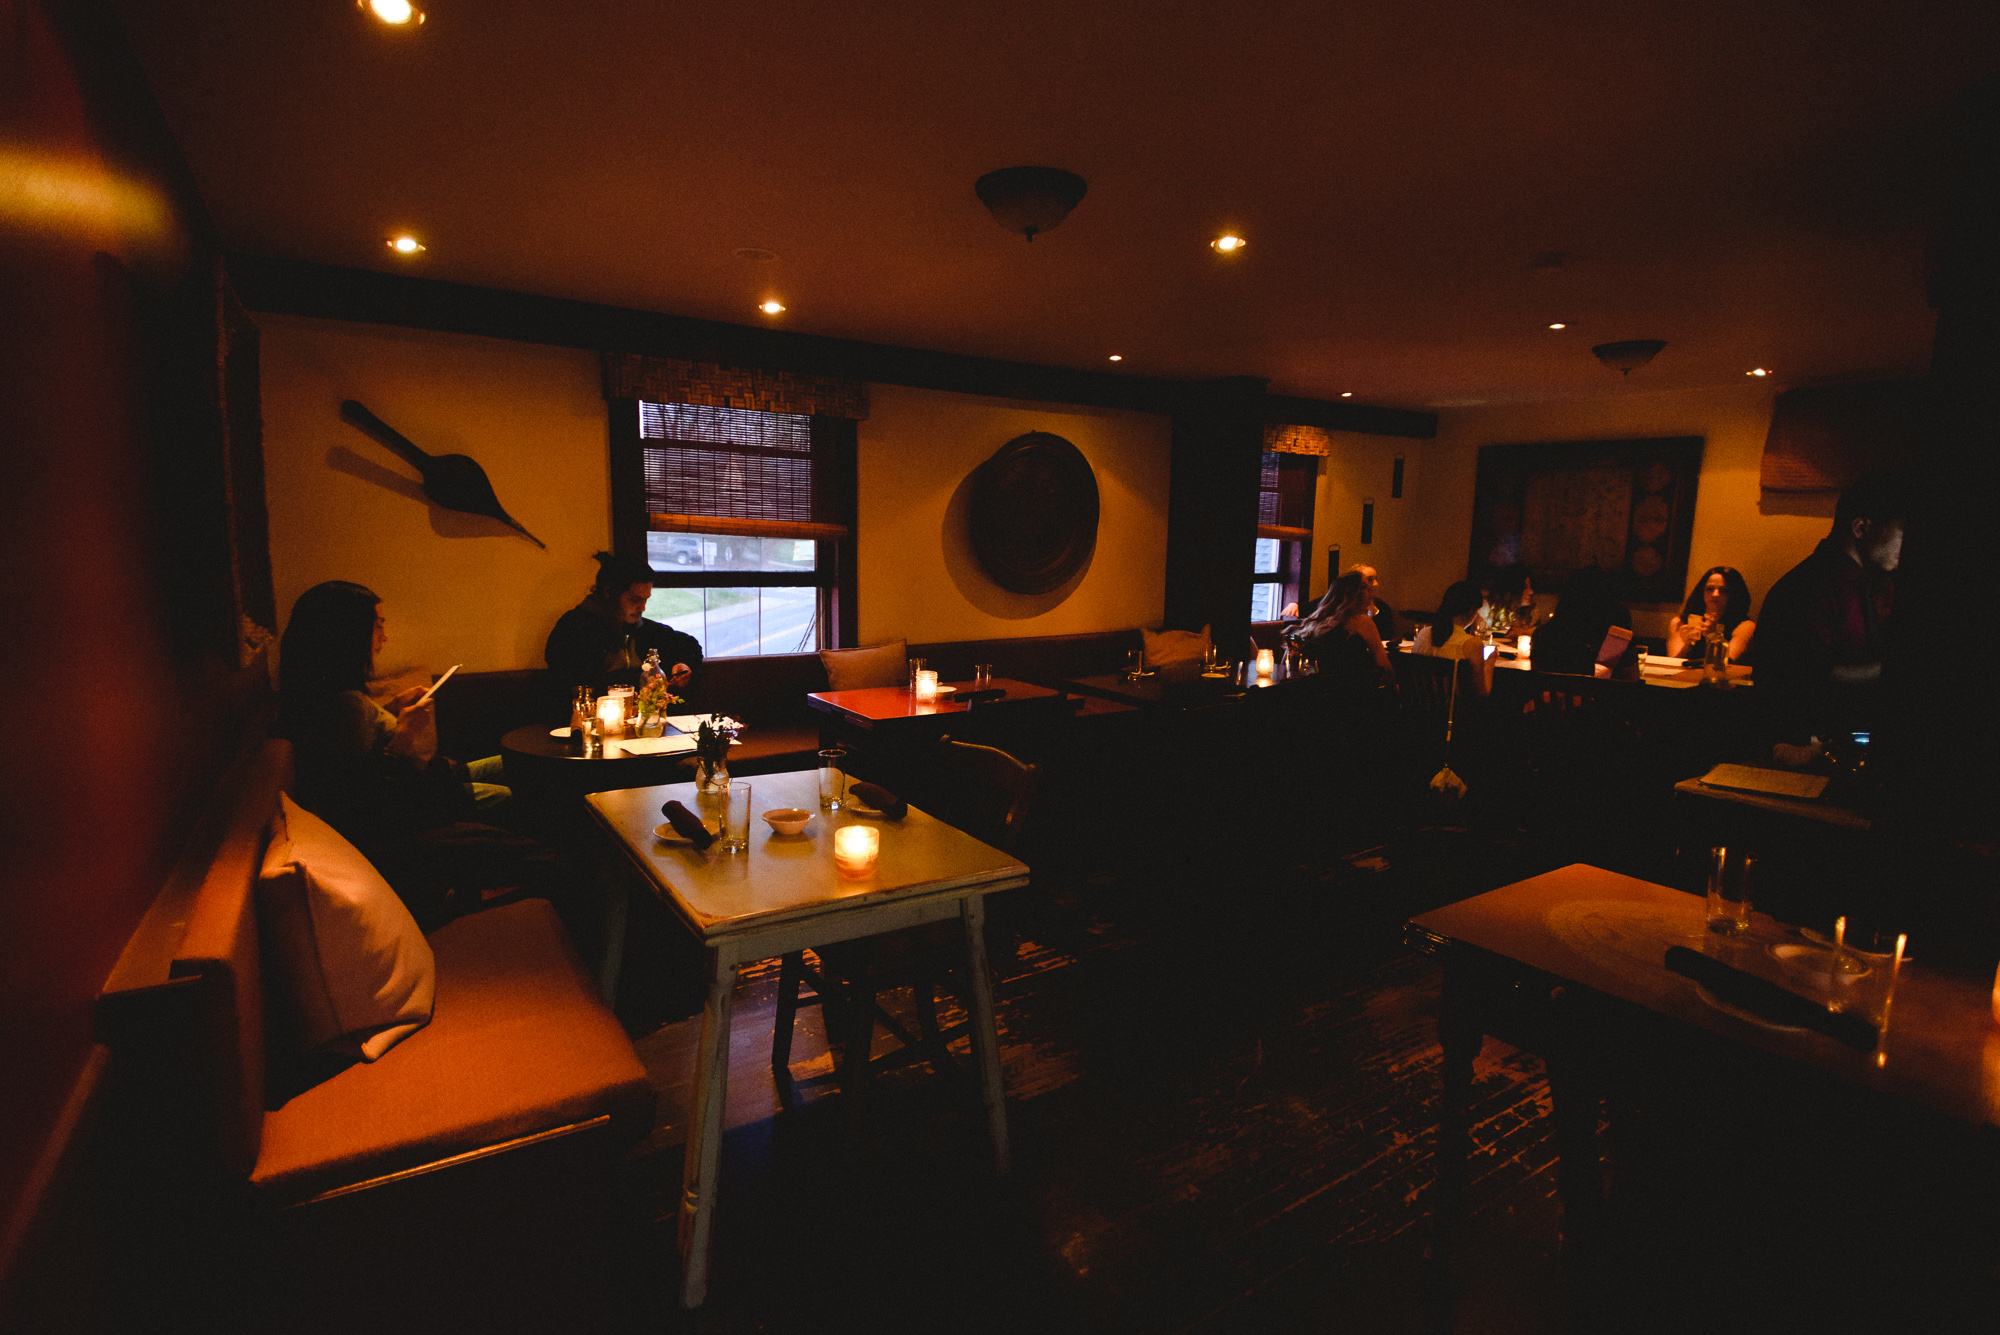 A-Tavola-Trattoria-New-Paltz-Hudson-Valley-NY-Best-Italian-Restaurant-235.jpg